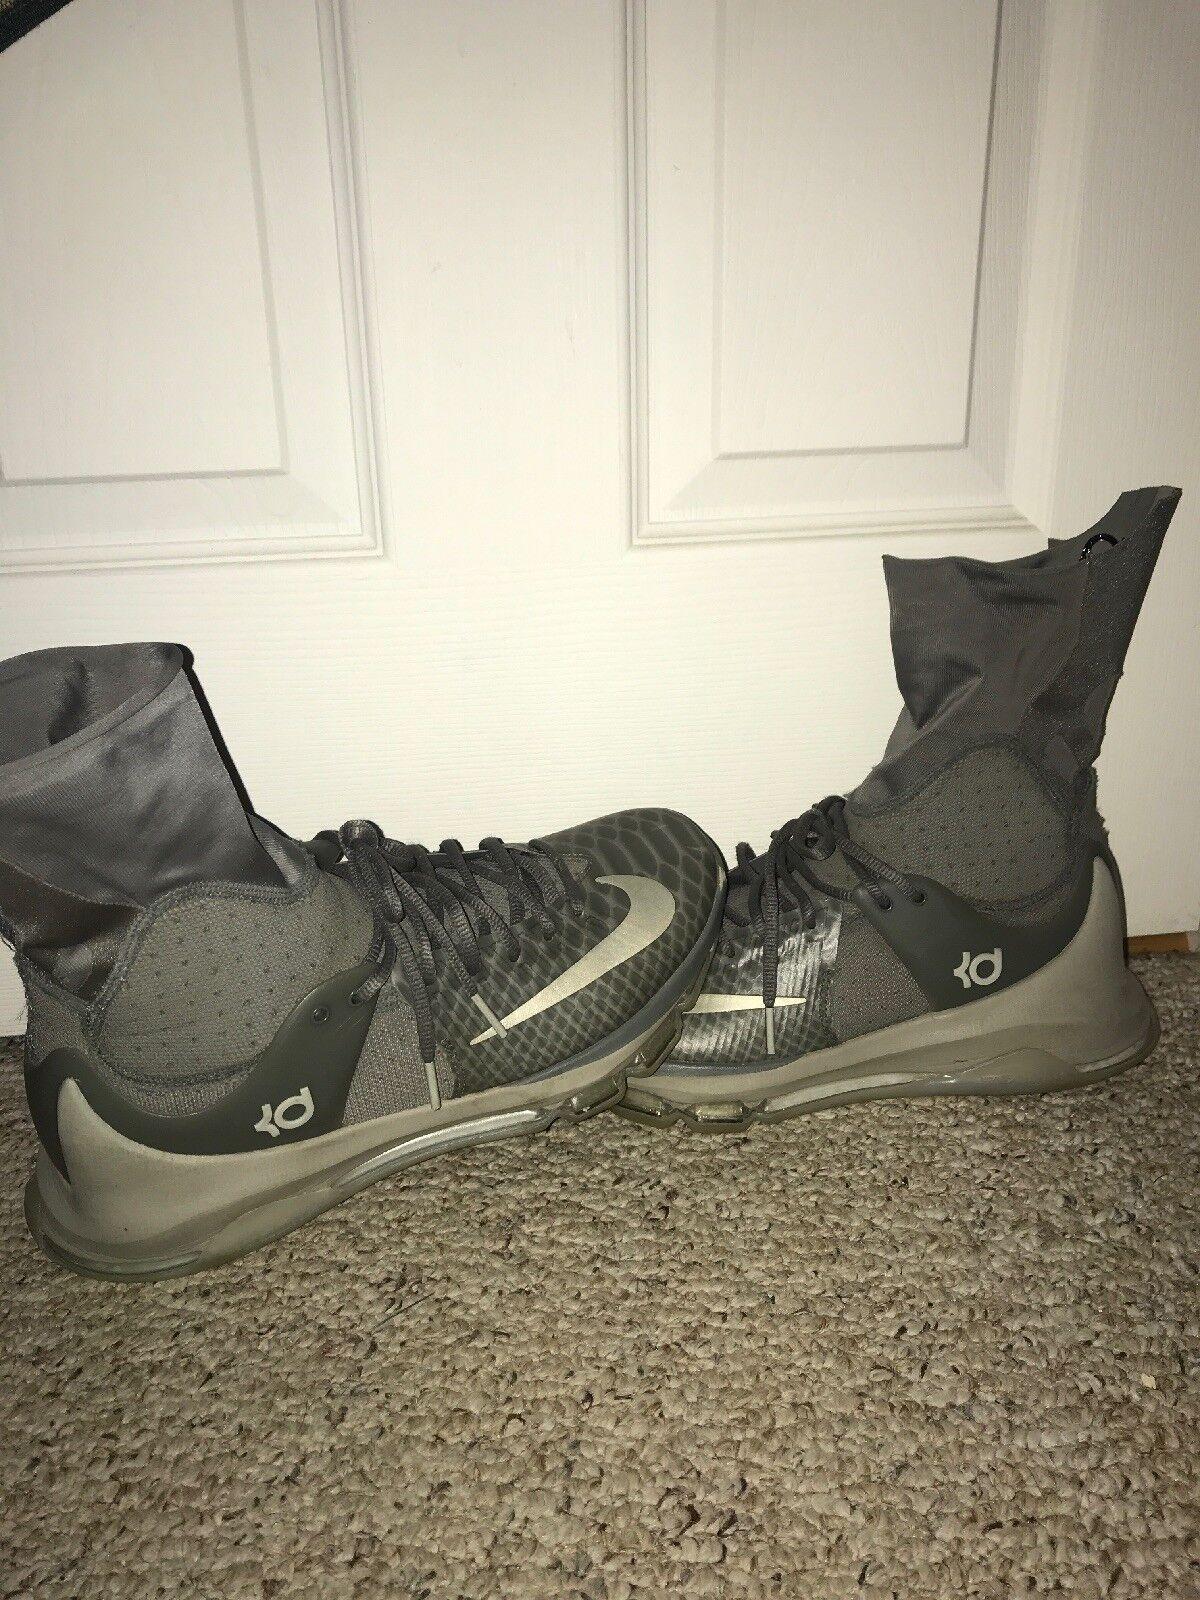 Nike KD 8 Elite Grey White Basketball shoes 834185-001 Mens Size 9